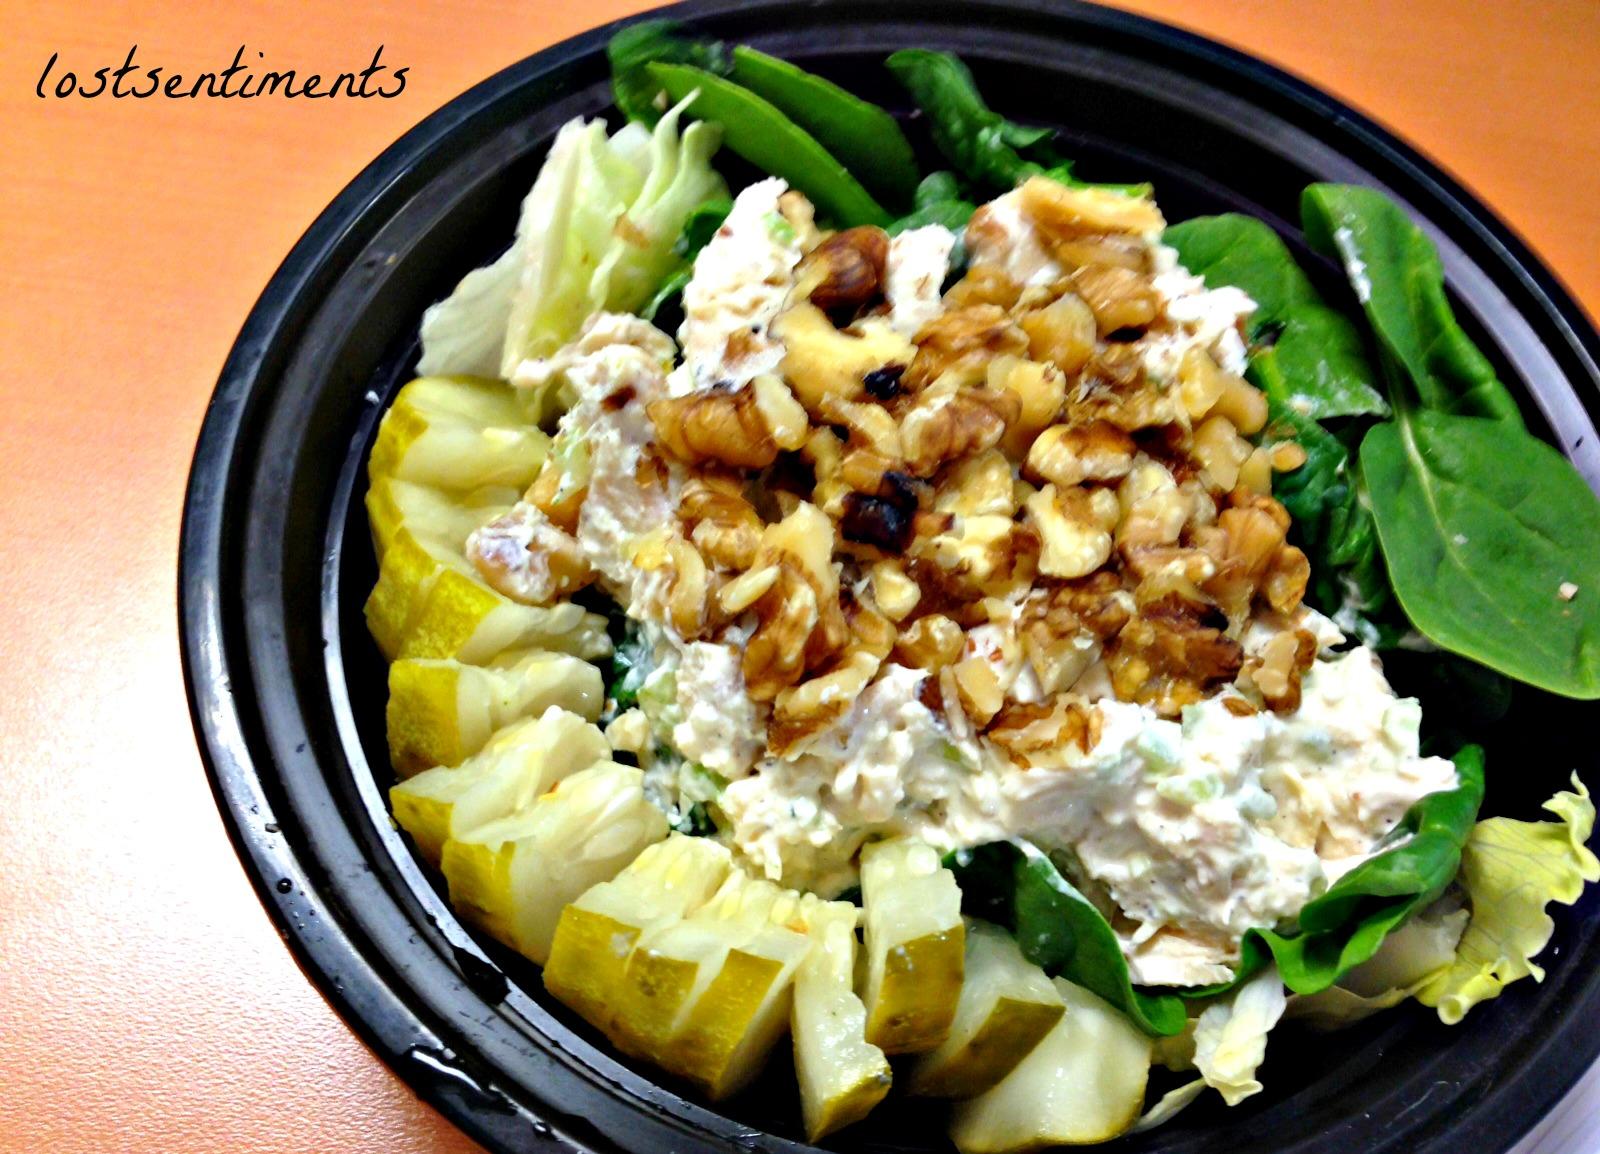 lostsentiments: Chicken Salad Salad Recipe